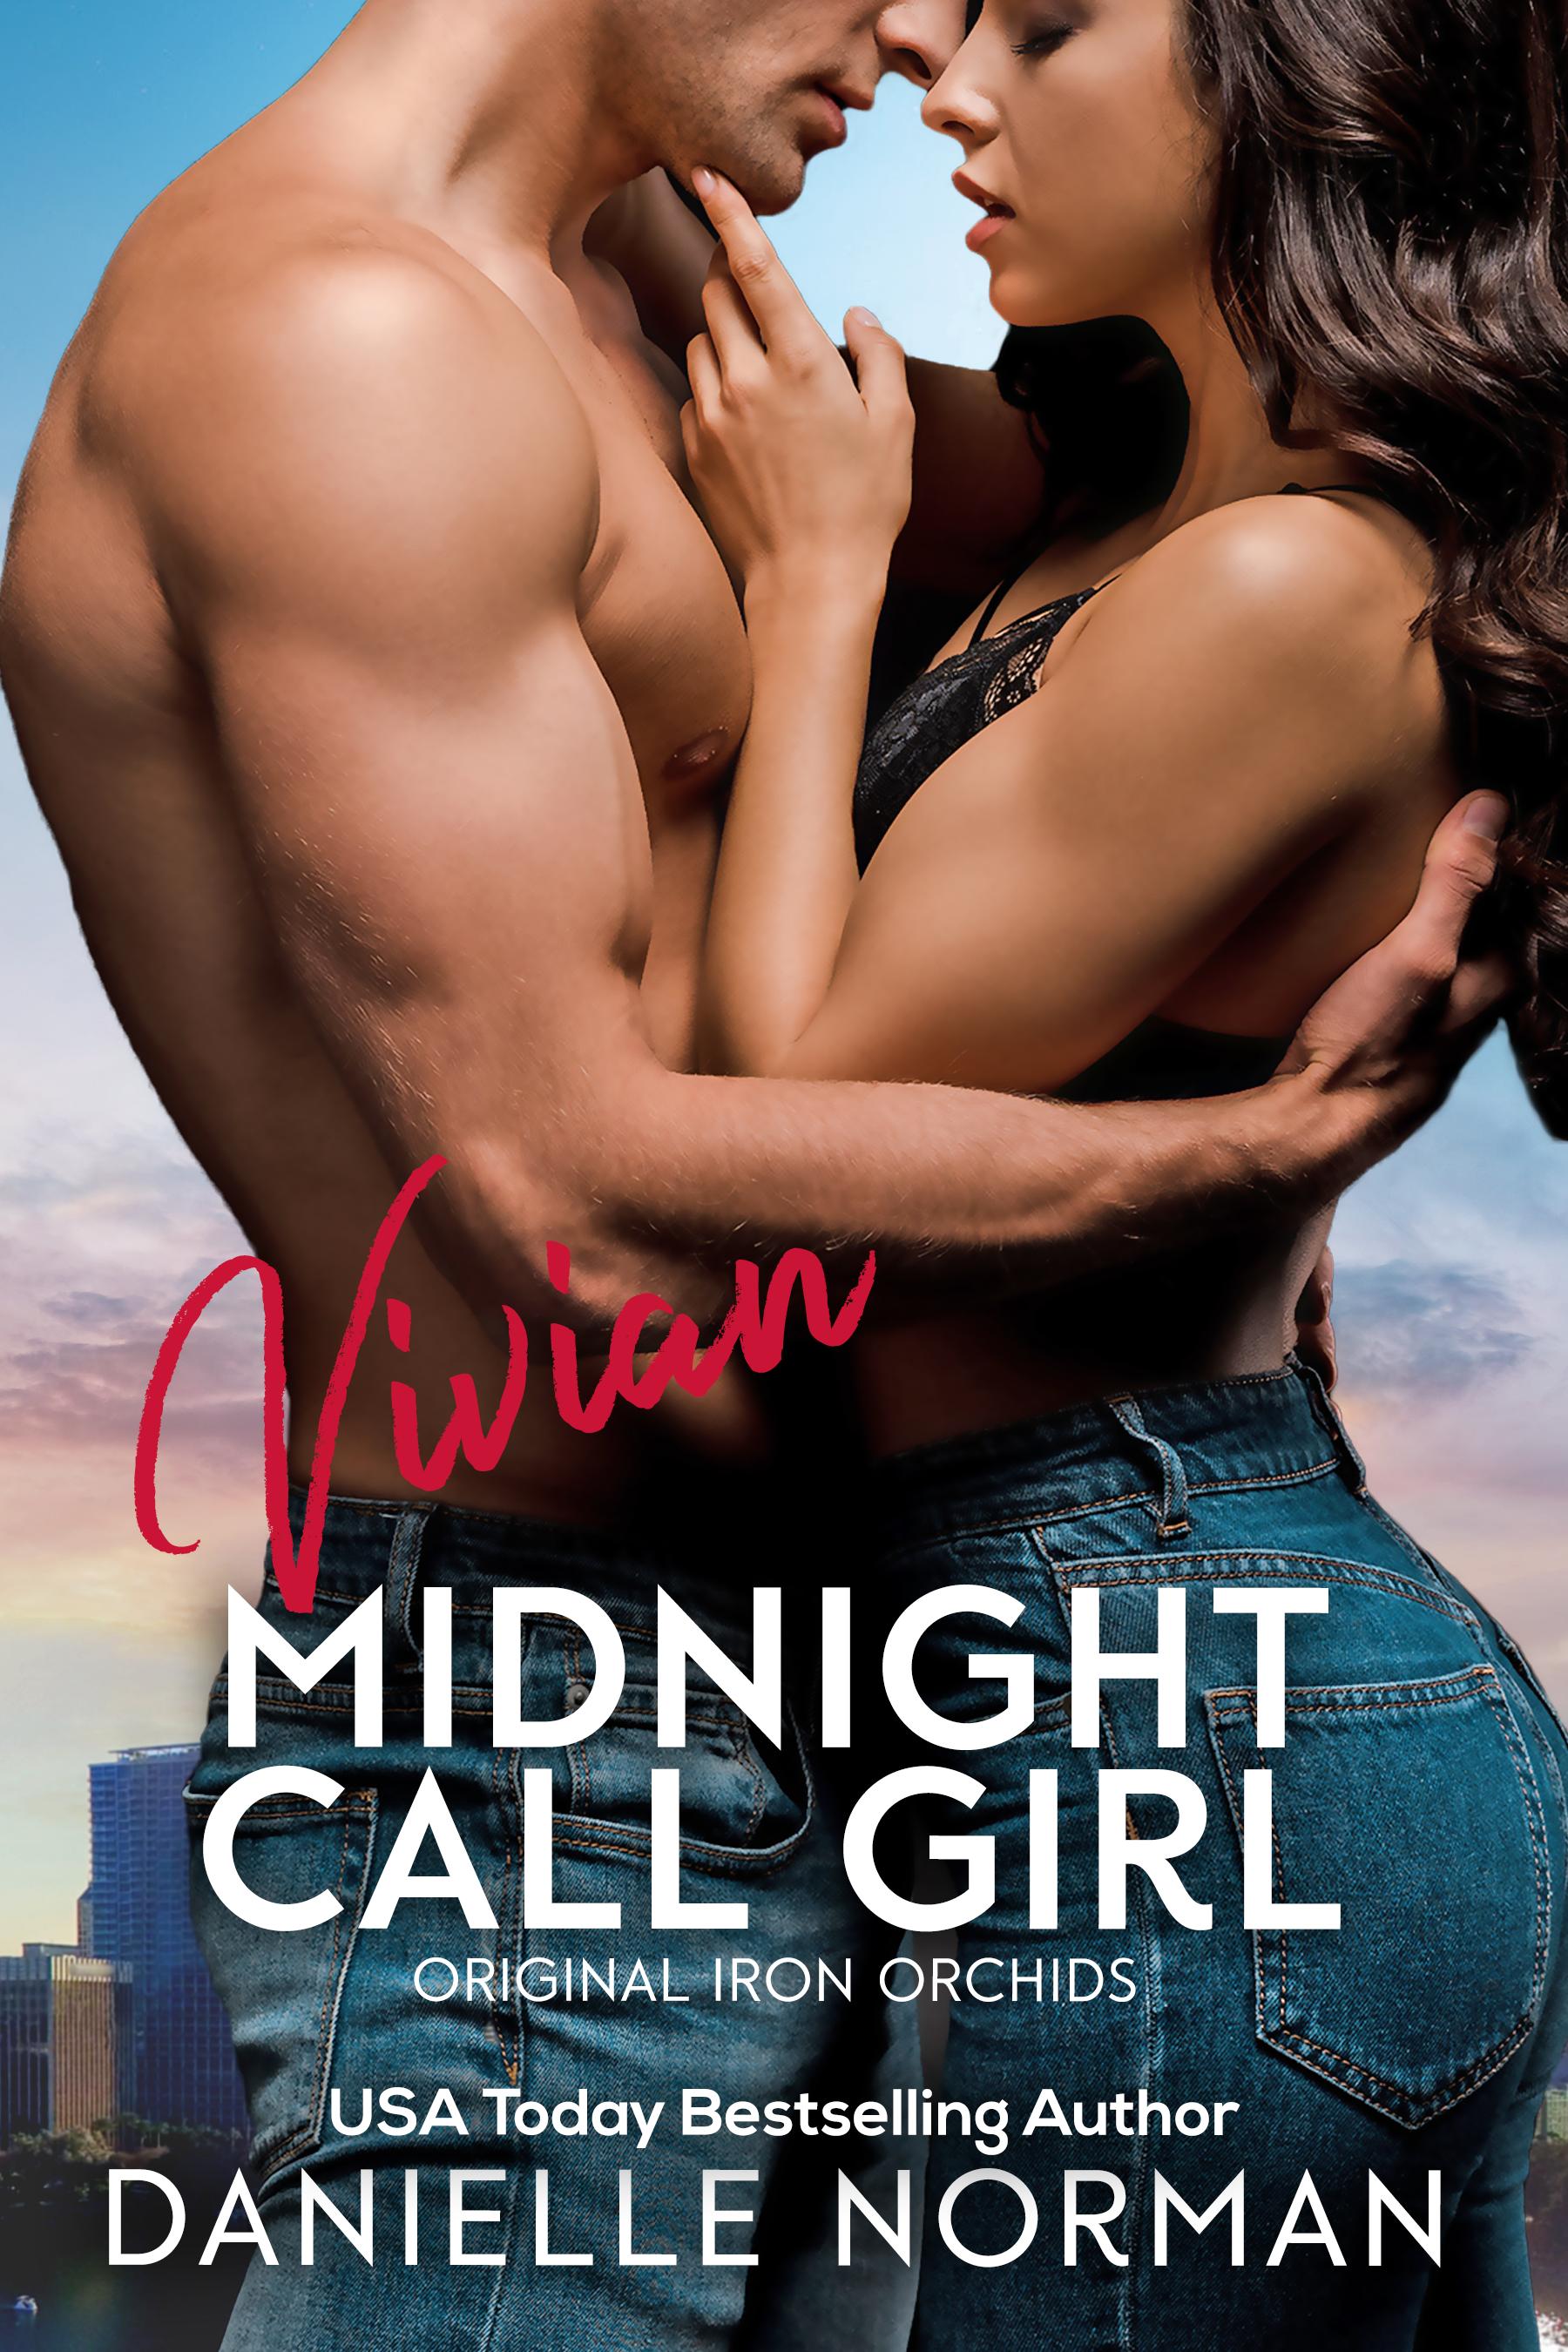 Danielle Norman - Iron Orchids 6 - Vivian, Midnight Call Girl